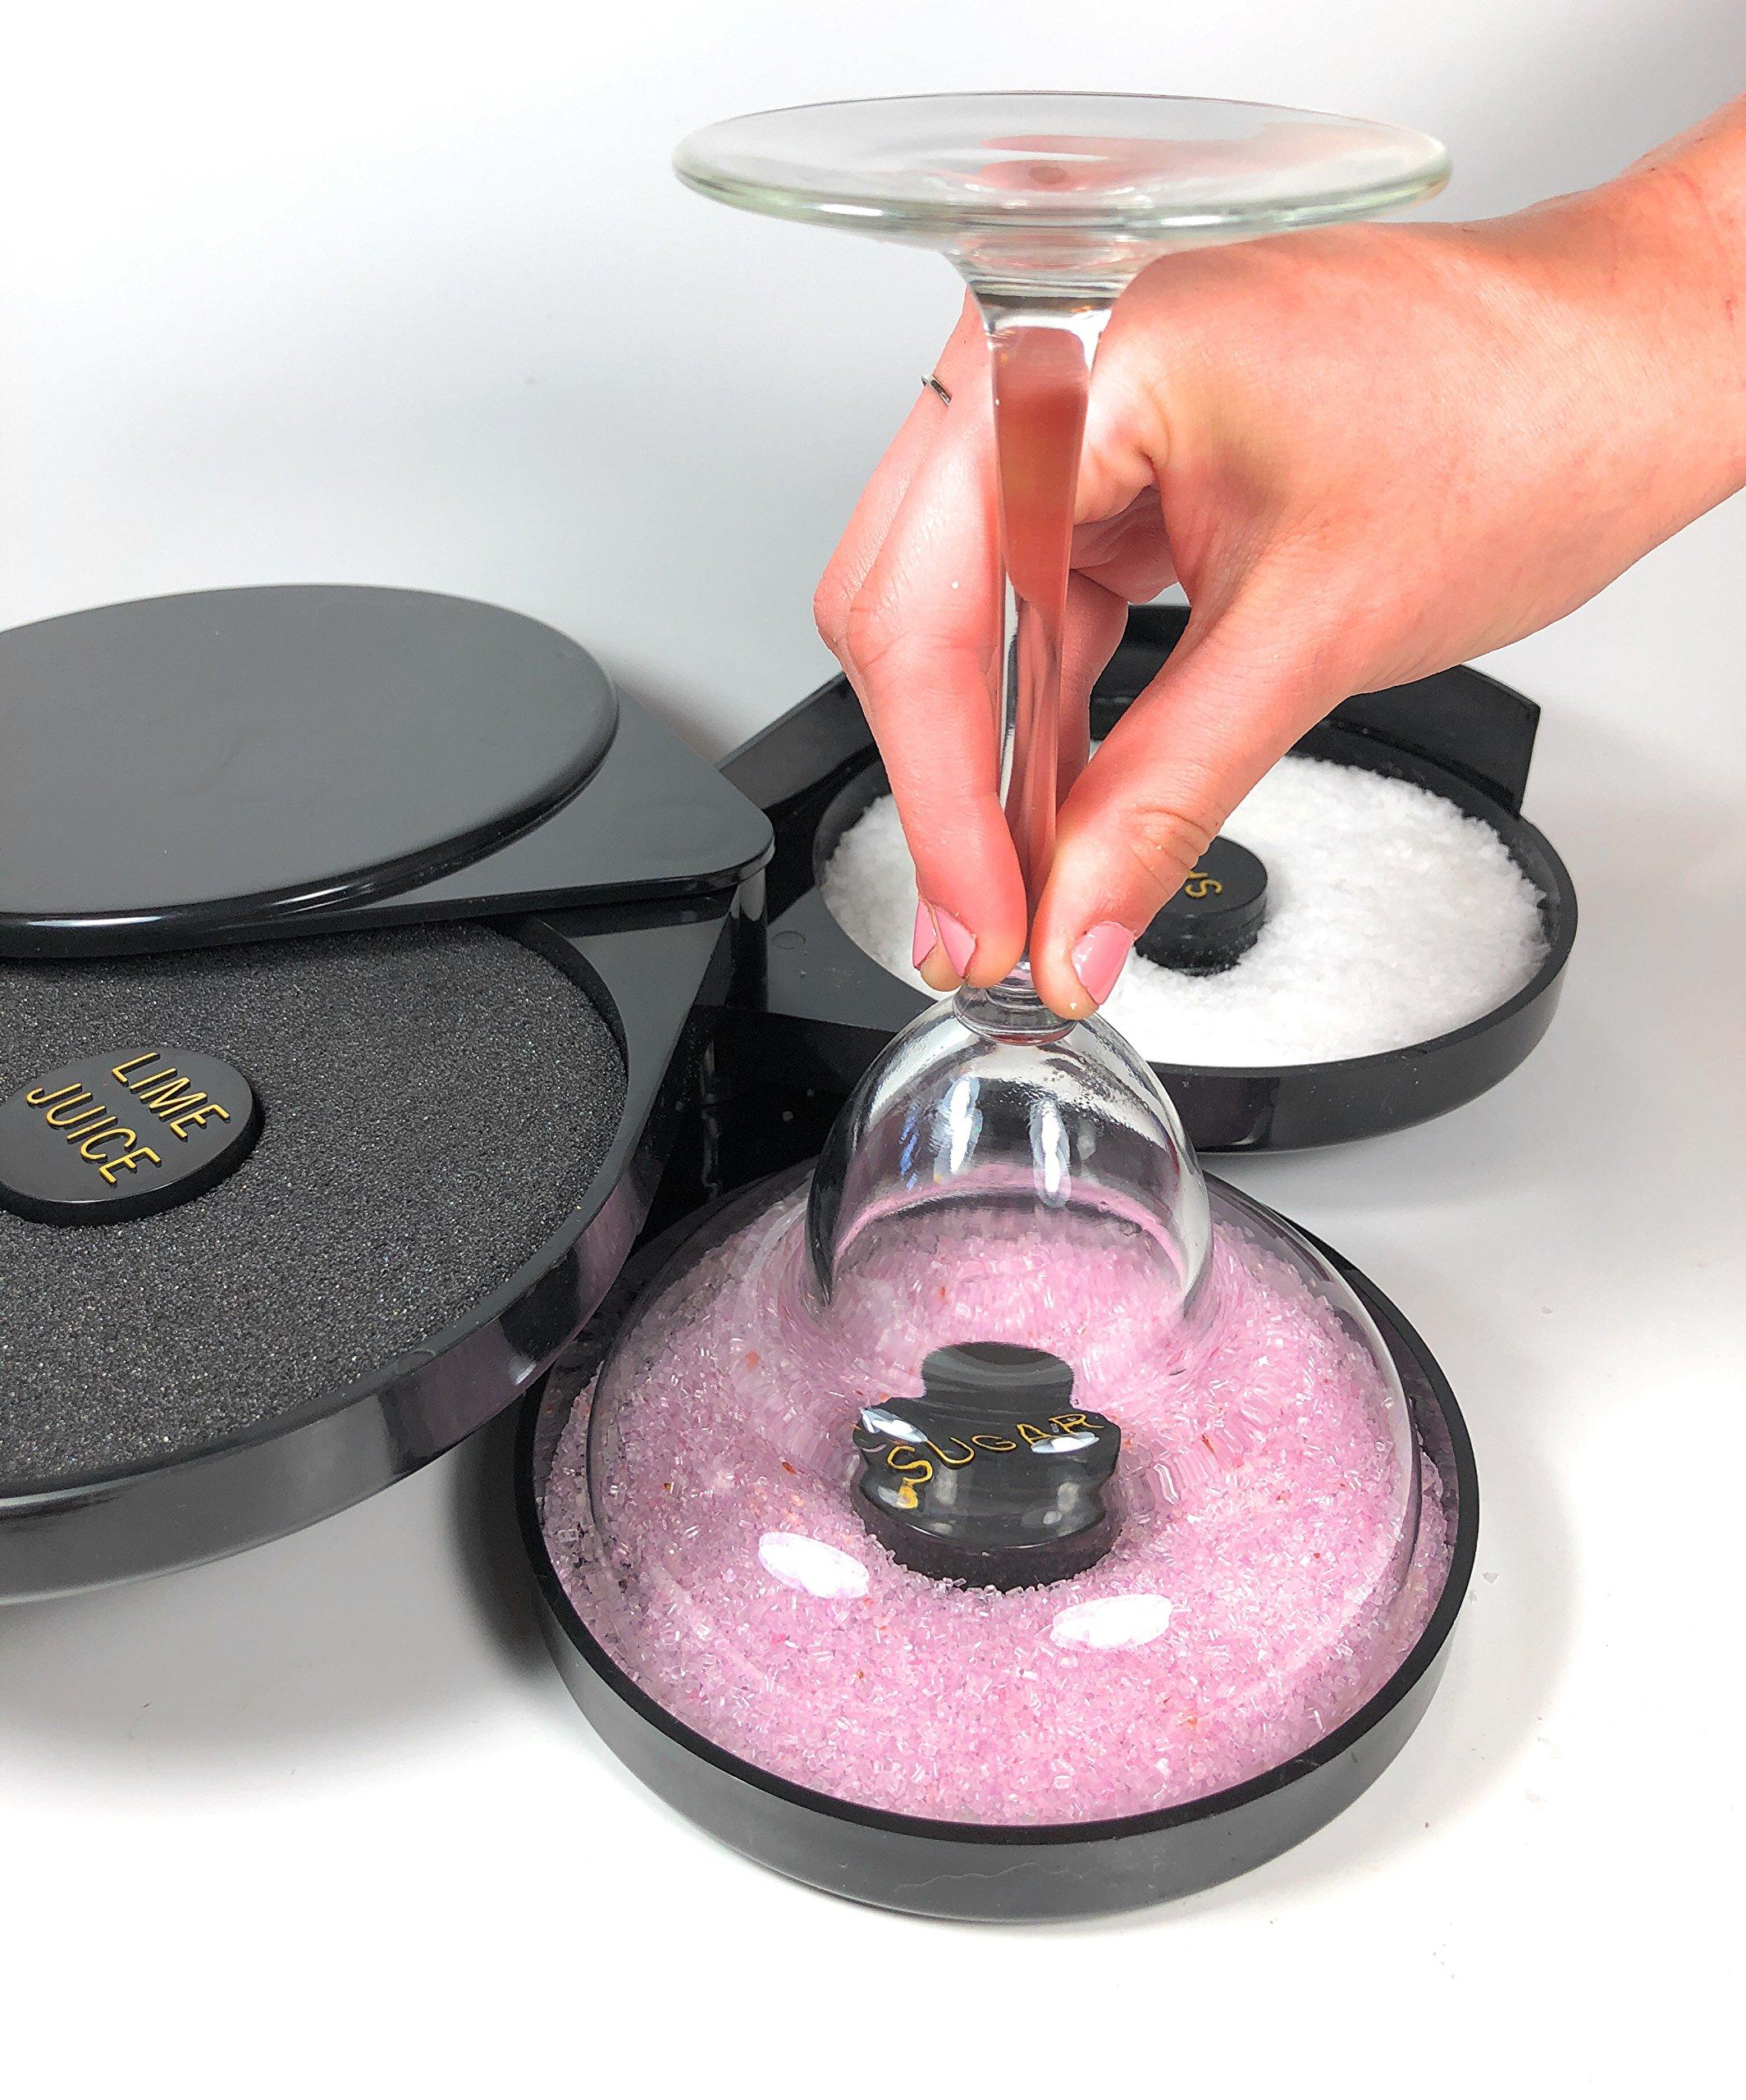 Margarita Salt Glass Rimmer BUNDLE - Bar Quality Rimmer, 8oz Margarita Salt Container, 3 Replacement Sponges | Perfect for Margaritas & Cocktails | 3-Tier Rotating Trays Salt Sugar Lime Juice SUMMIT by SUMMIT Salt Rimmer Bundle (Image #9)